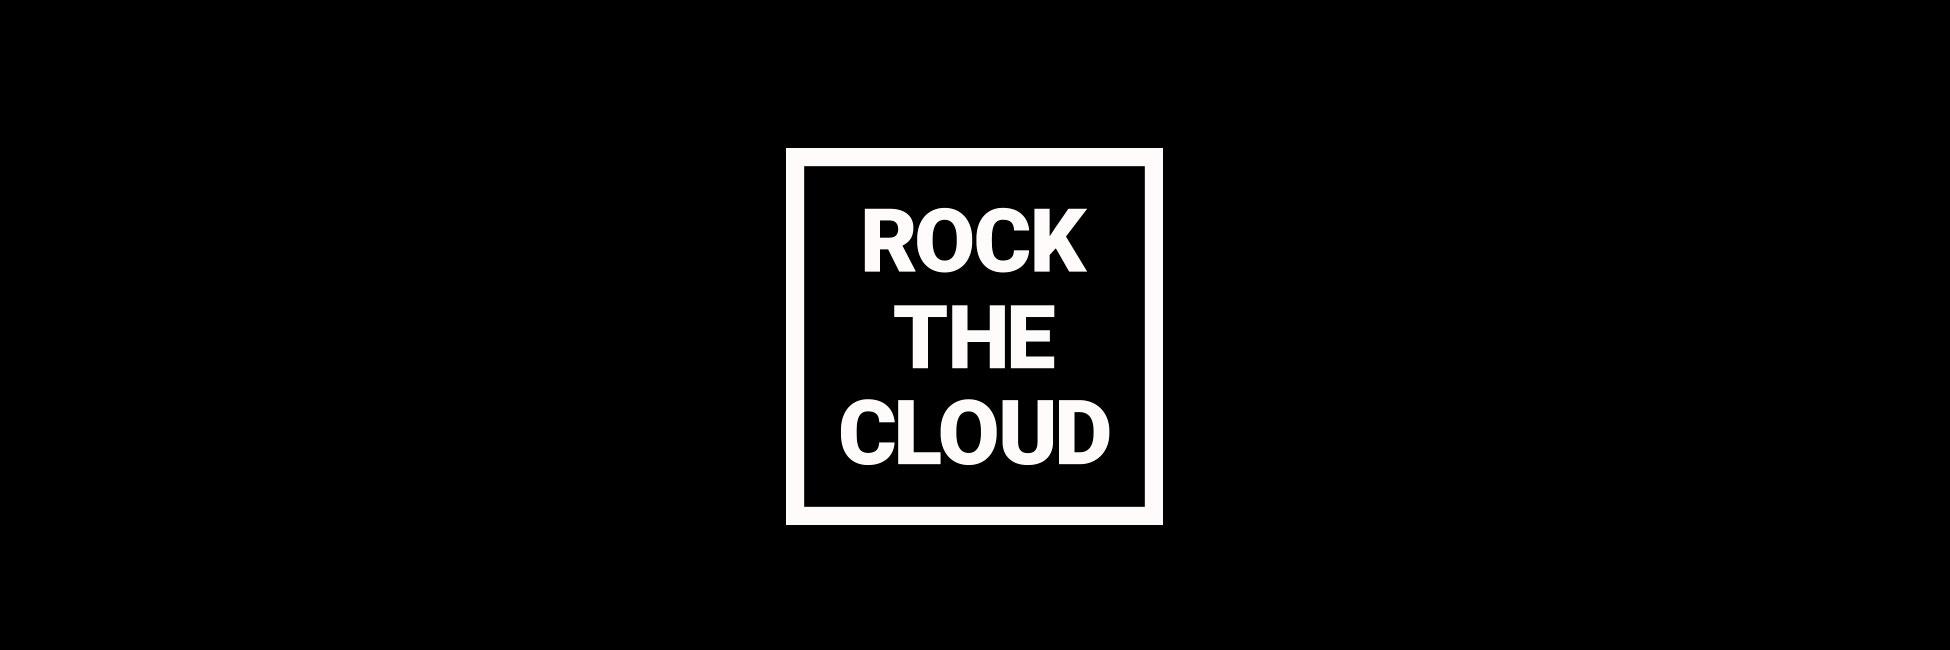 rockthecloud